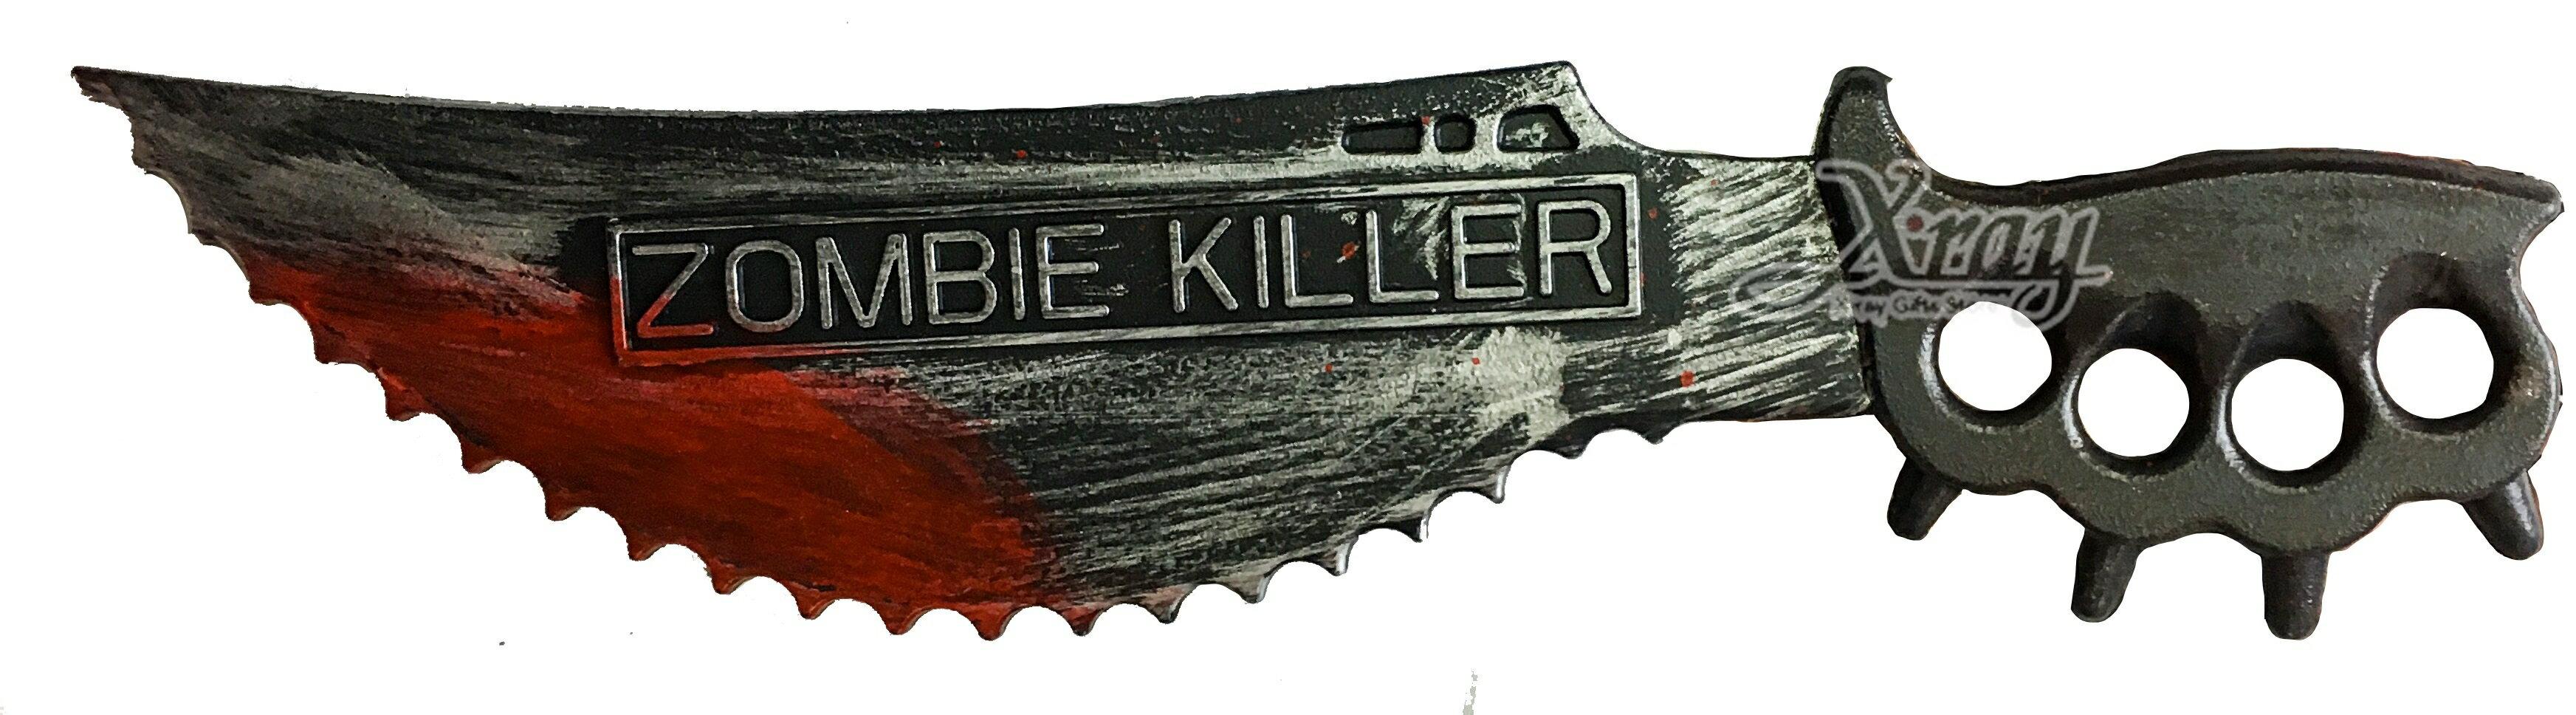 X射線【W287332】20吋帶血殭屍殺手刀,萬聖節 / 武器 / 道具刀 / Party / 遊戲用刀 / 化妝舞會 / 武器配件 0